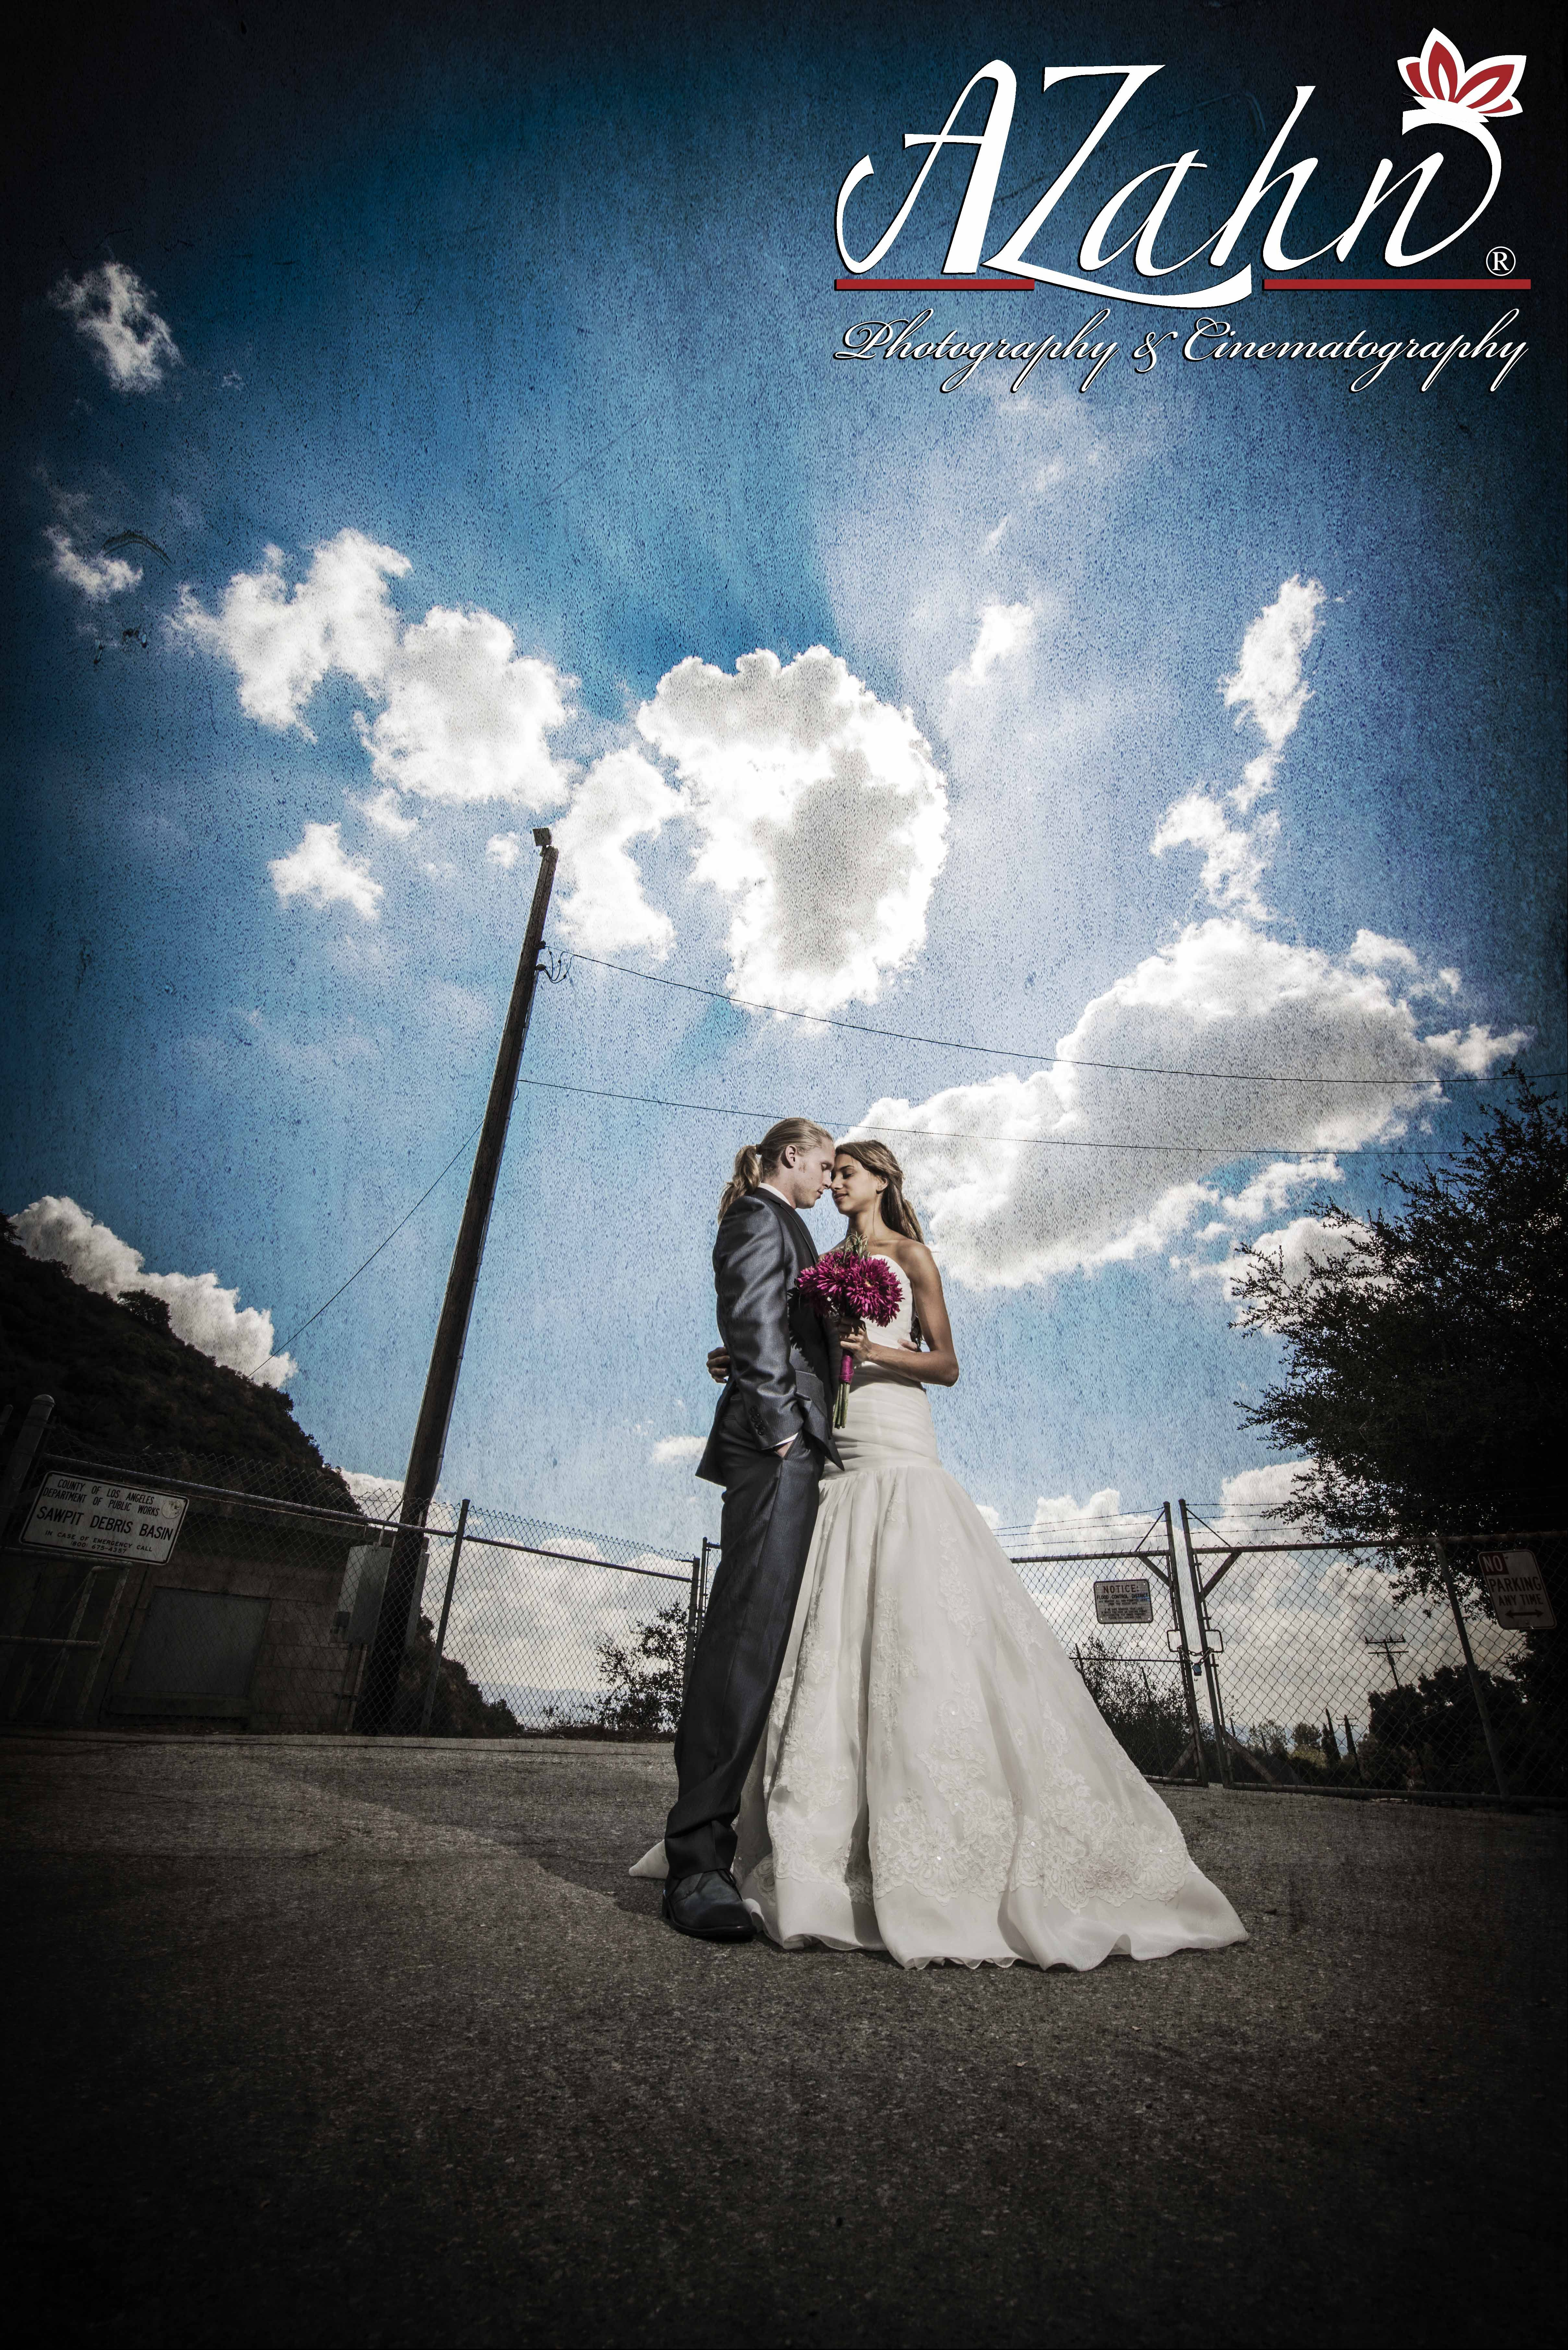 Wedding dress rental los angeles  Pin by AZahn Photography u Cinematography on Trash the Dress Photos